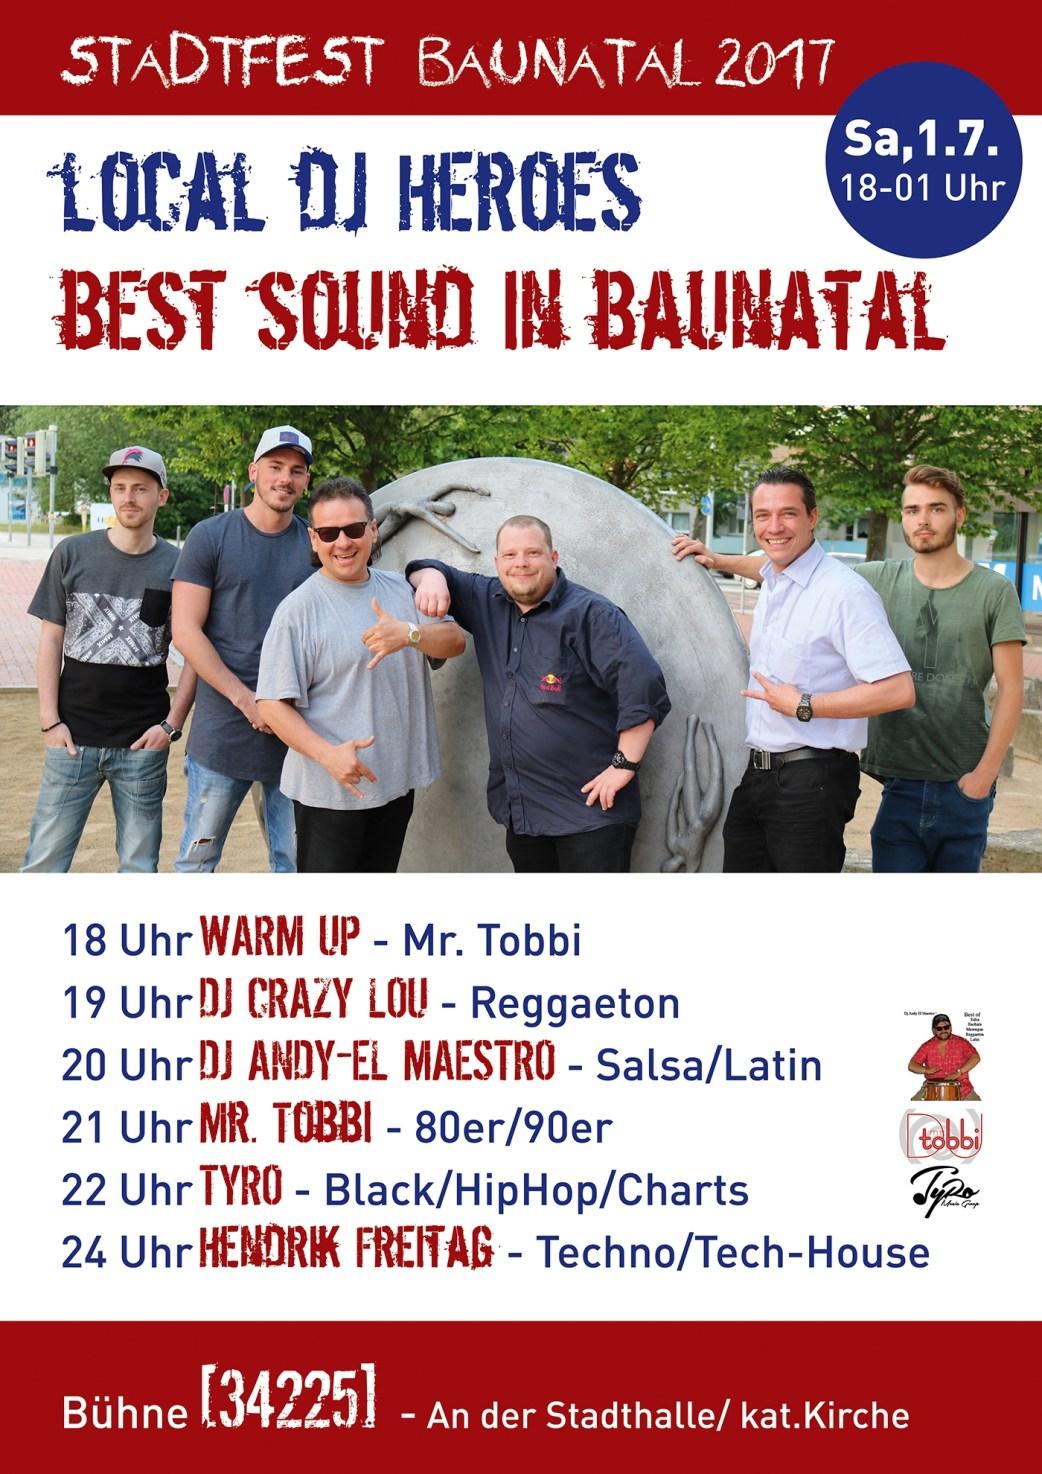 Stadtfest Baunatal, Nachrichten Baunatal, Stadtmarketing Baunatal; LOCAL DJ HERORES; Mr. Tobbi; DJ Crazy Lou; DJ Andy-El Maestro; TYRO Music; Hendrik Freitag